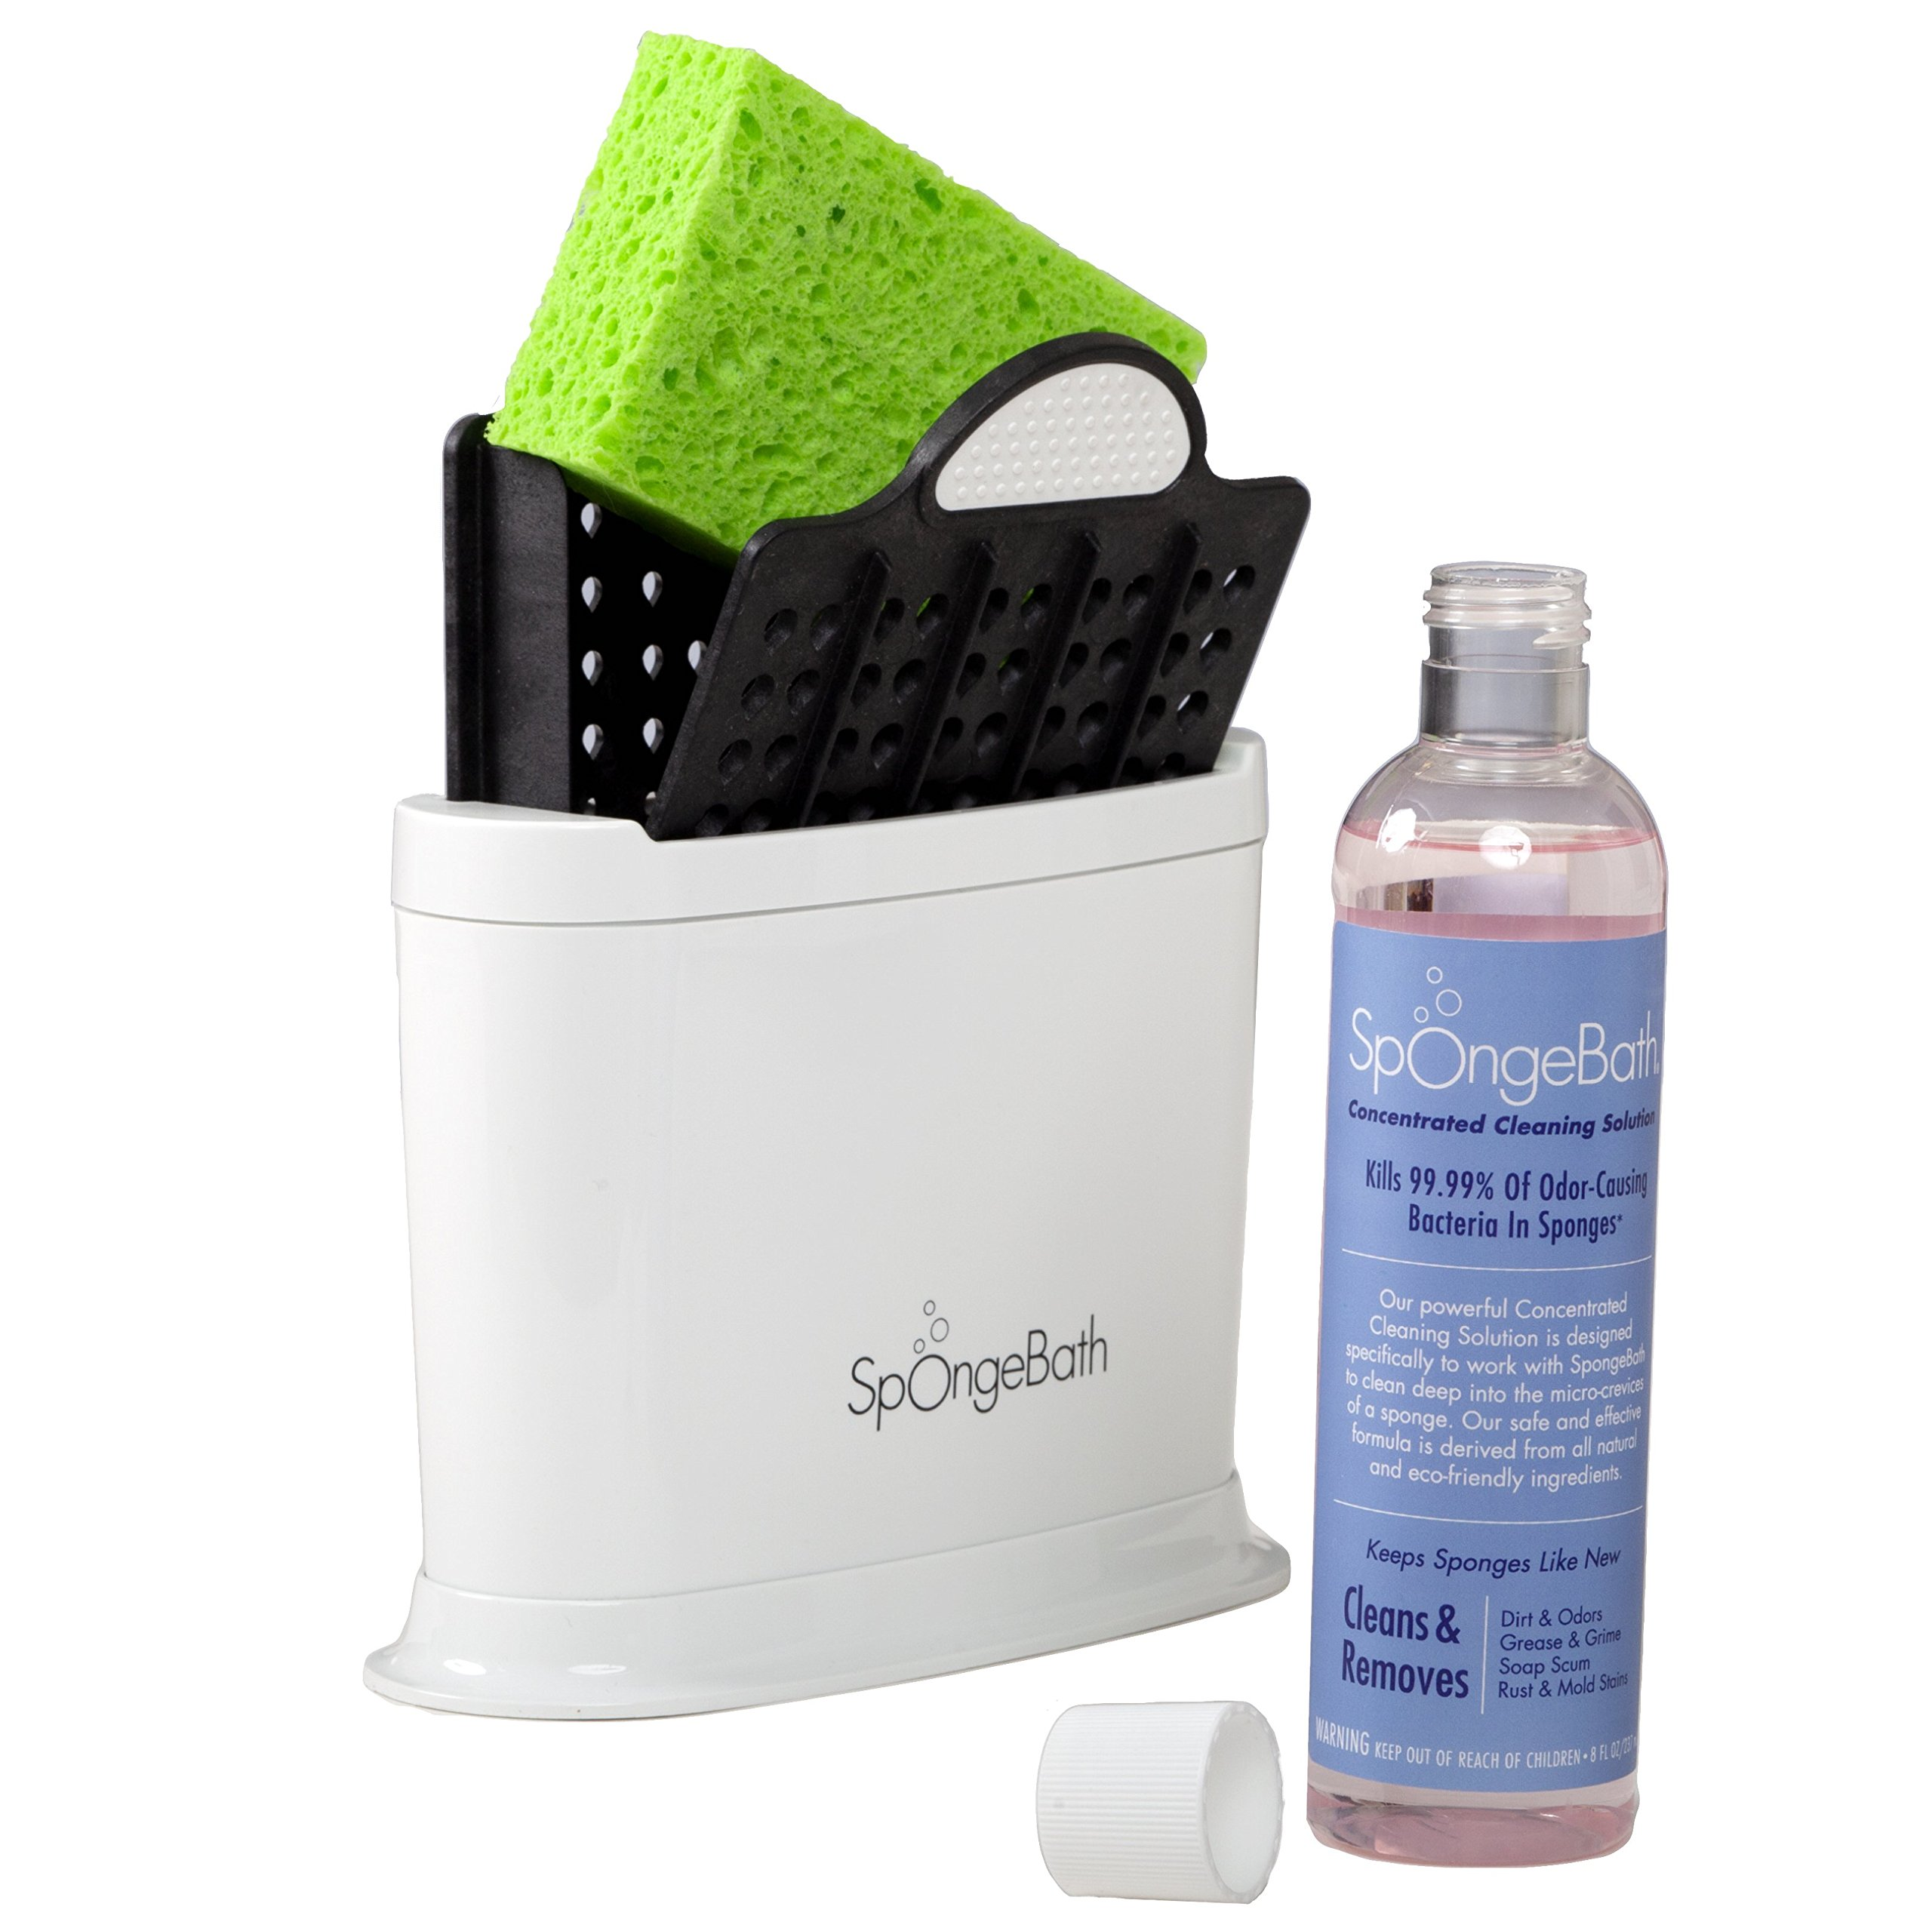 Kitchen Sponge Holder Cleans, Stores and Kills 99.99% of Odor-Causing Bacteria (White) – Organizer Caddy (SpongeBath)